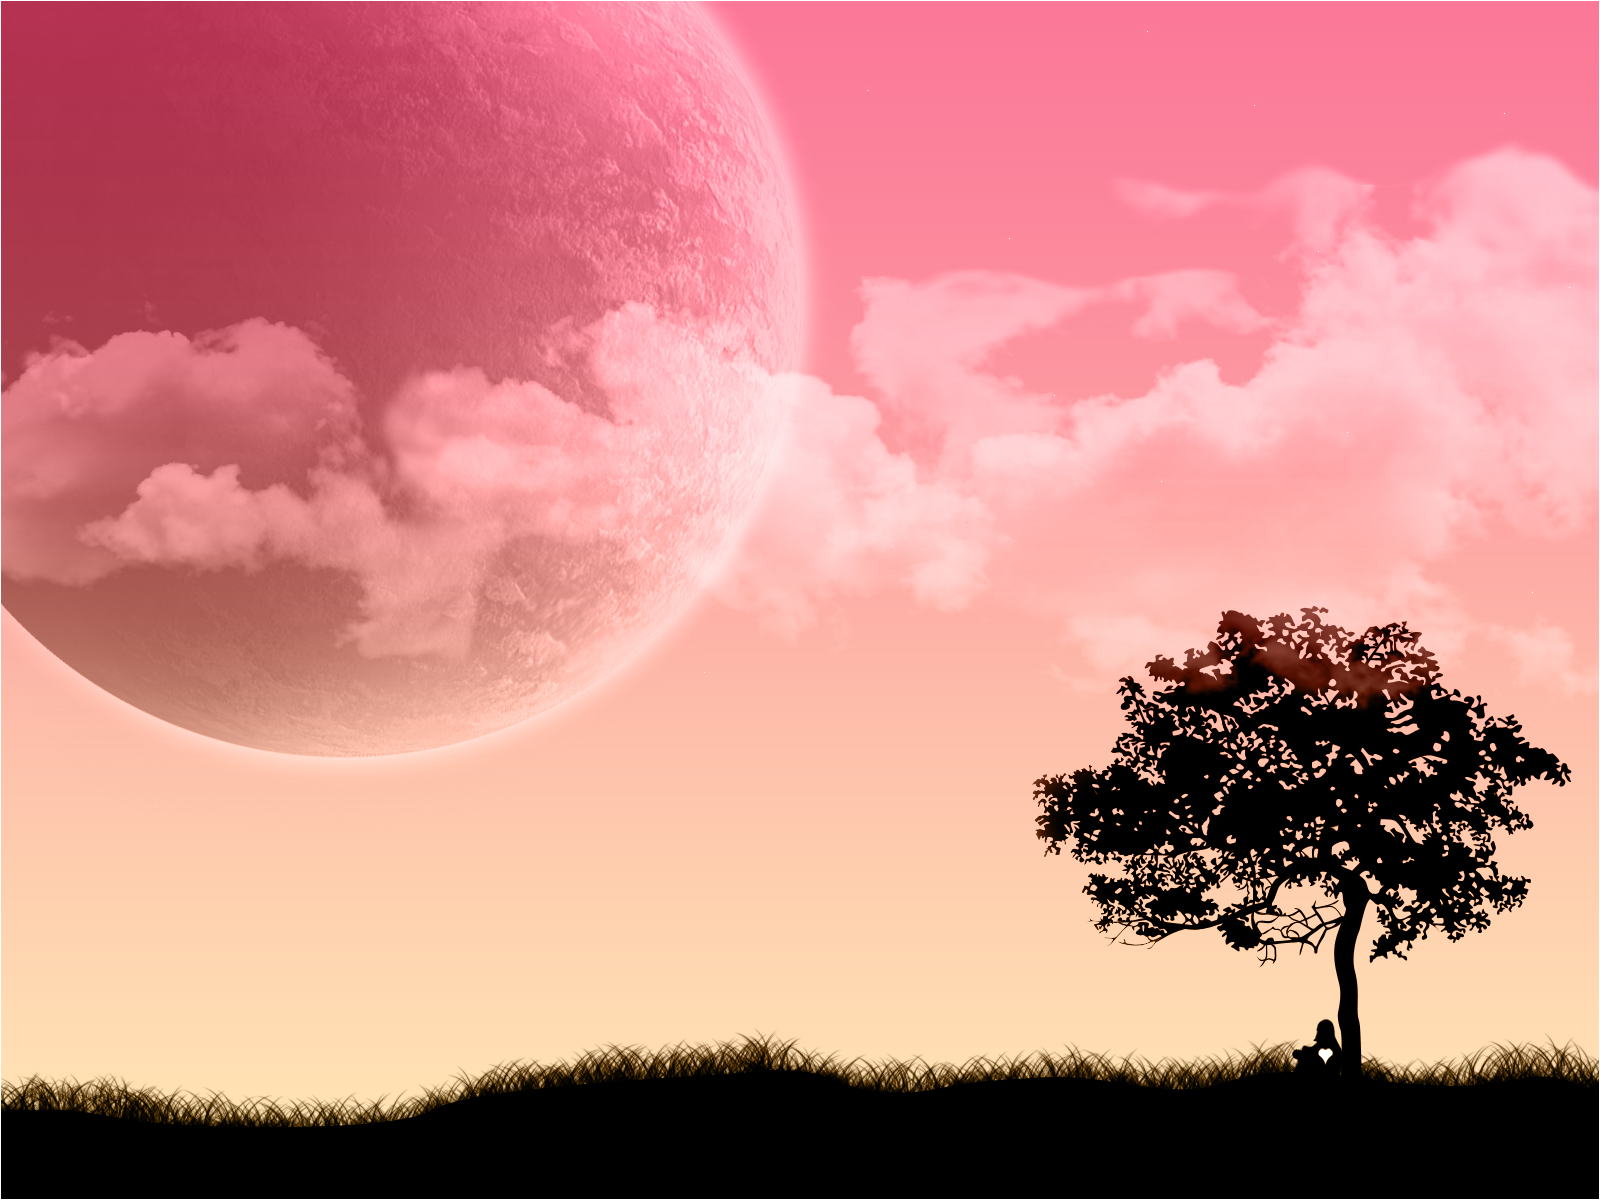 Pink And Black Wallpaper - HD Desktop Wallpapers